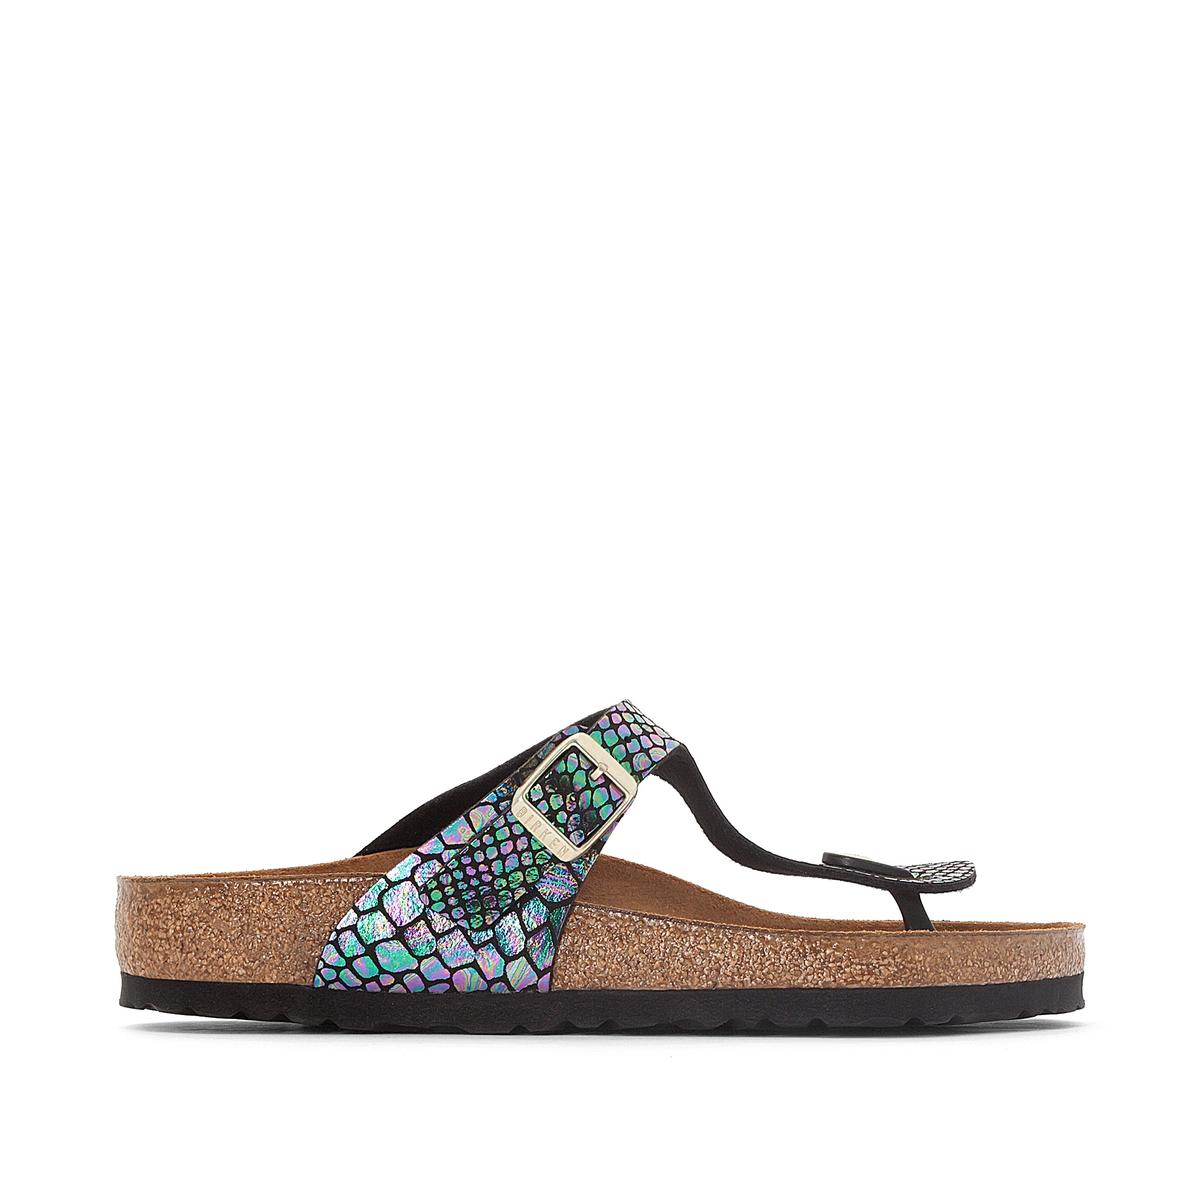 Туфли без задника с рисунком под кожу змеи GIZEH